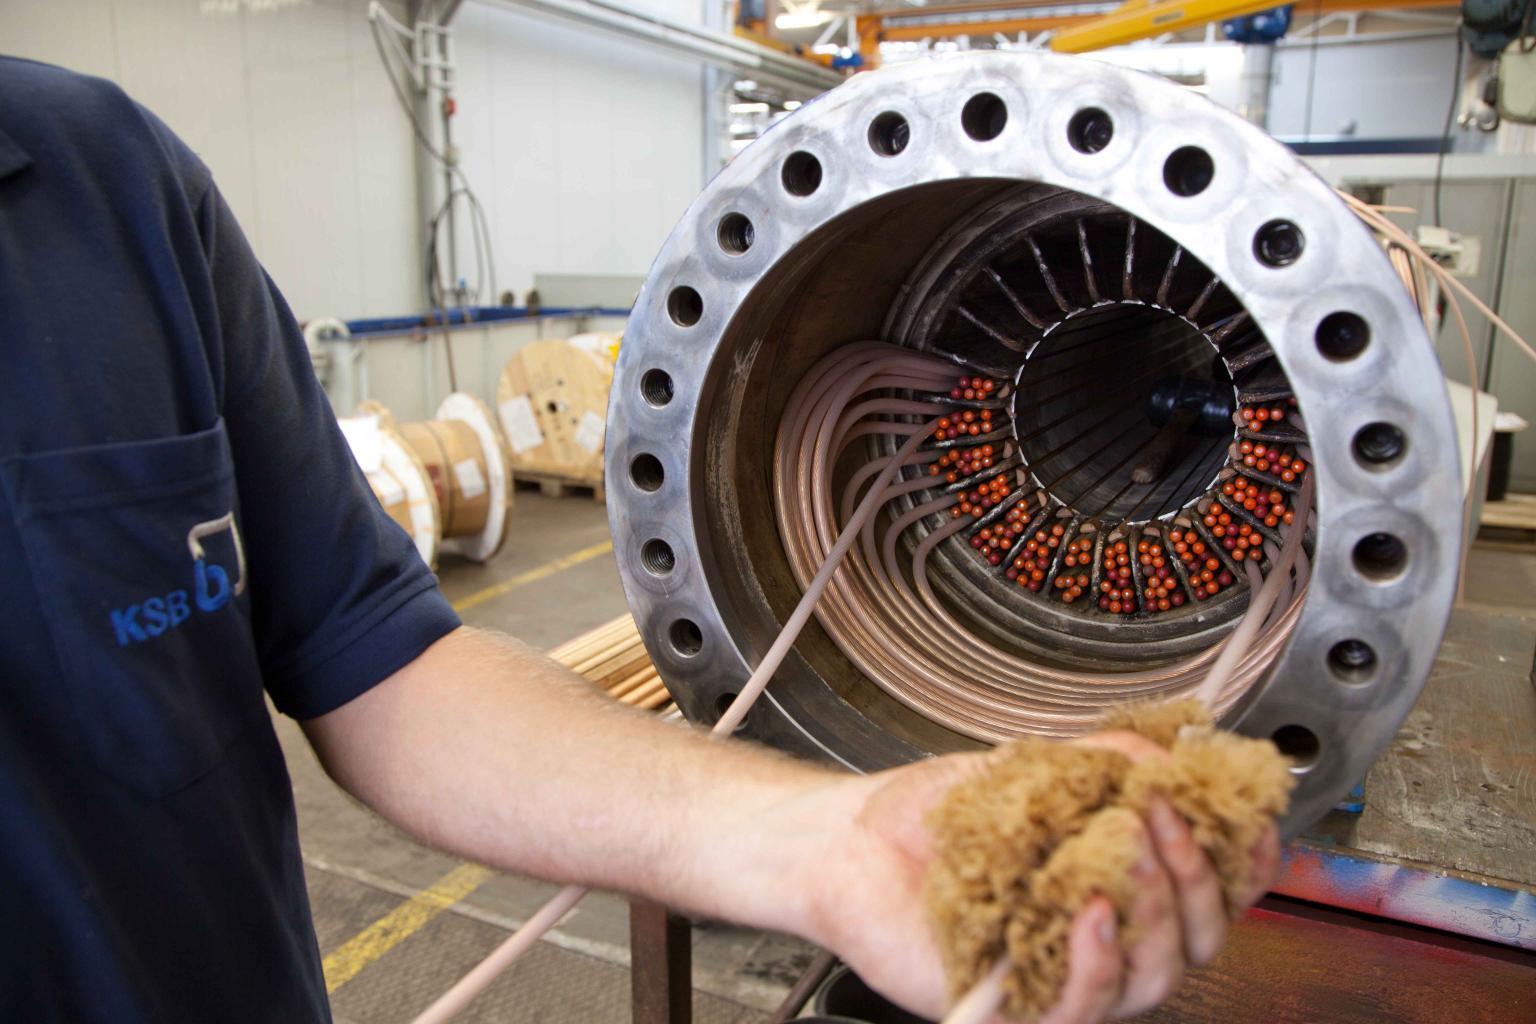 Assembling a submersible pump motor